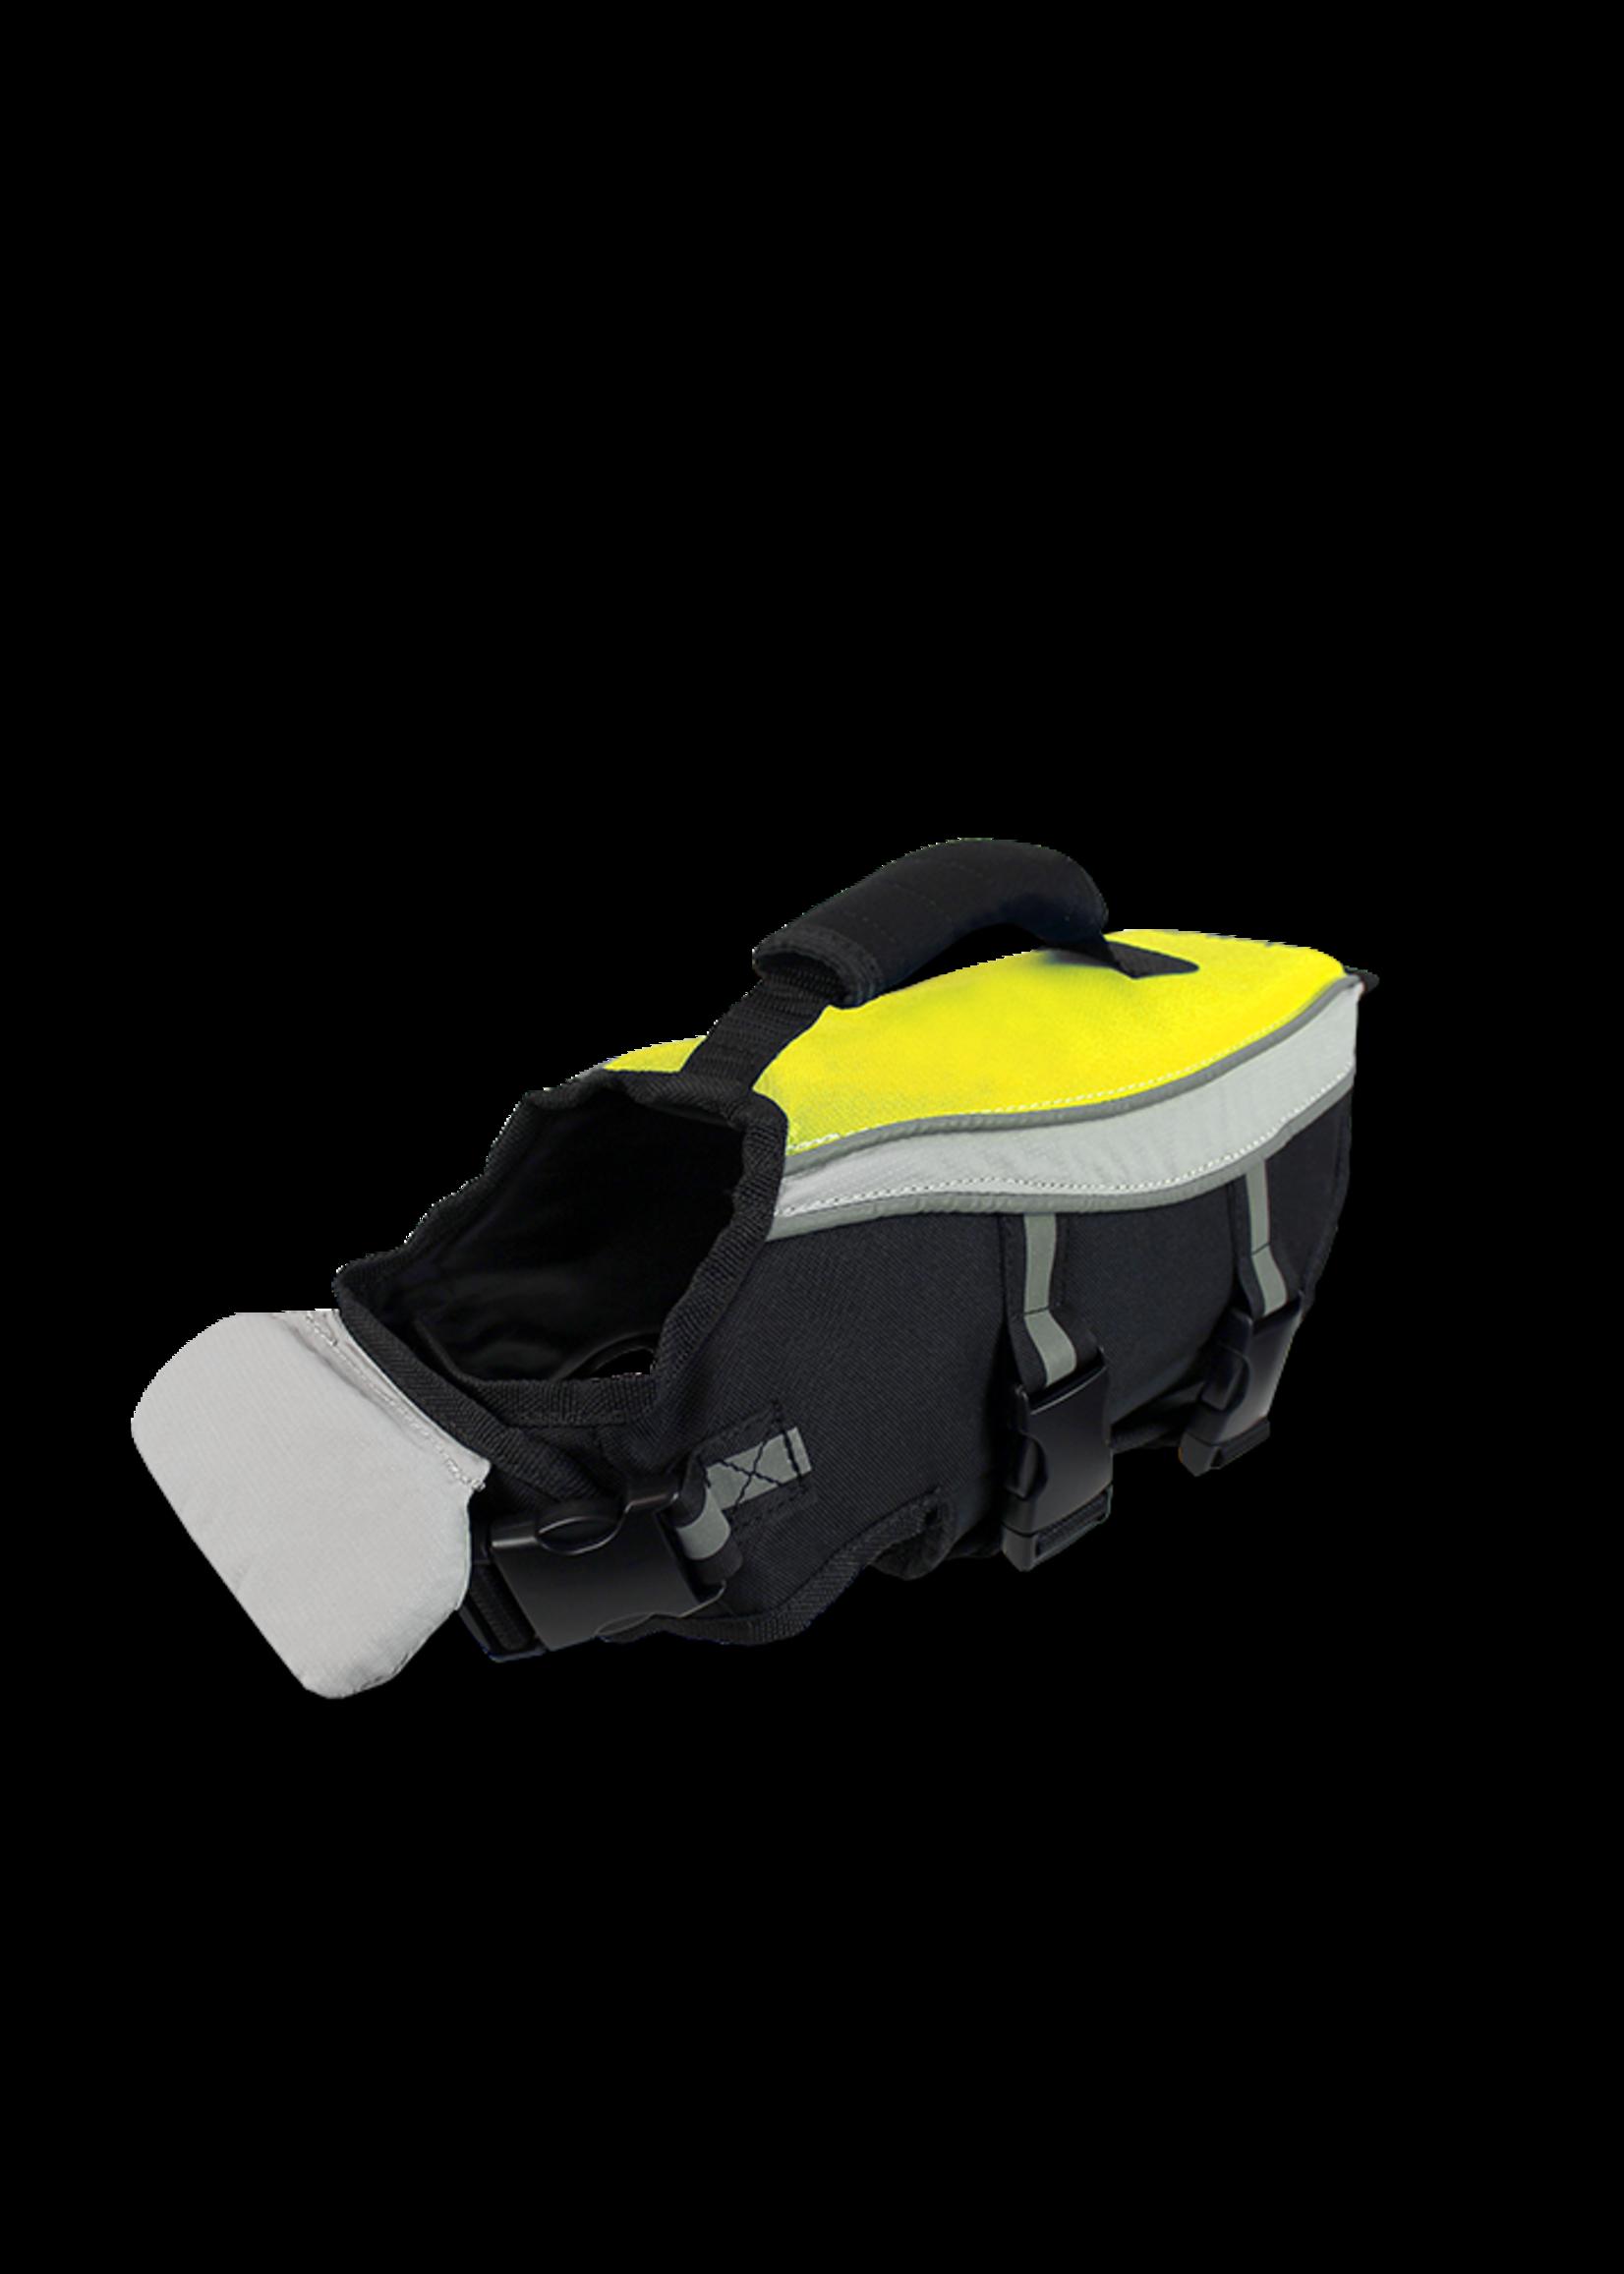 Alcott™ Alcott Water Adventure Jacket Yellow Small